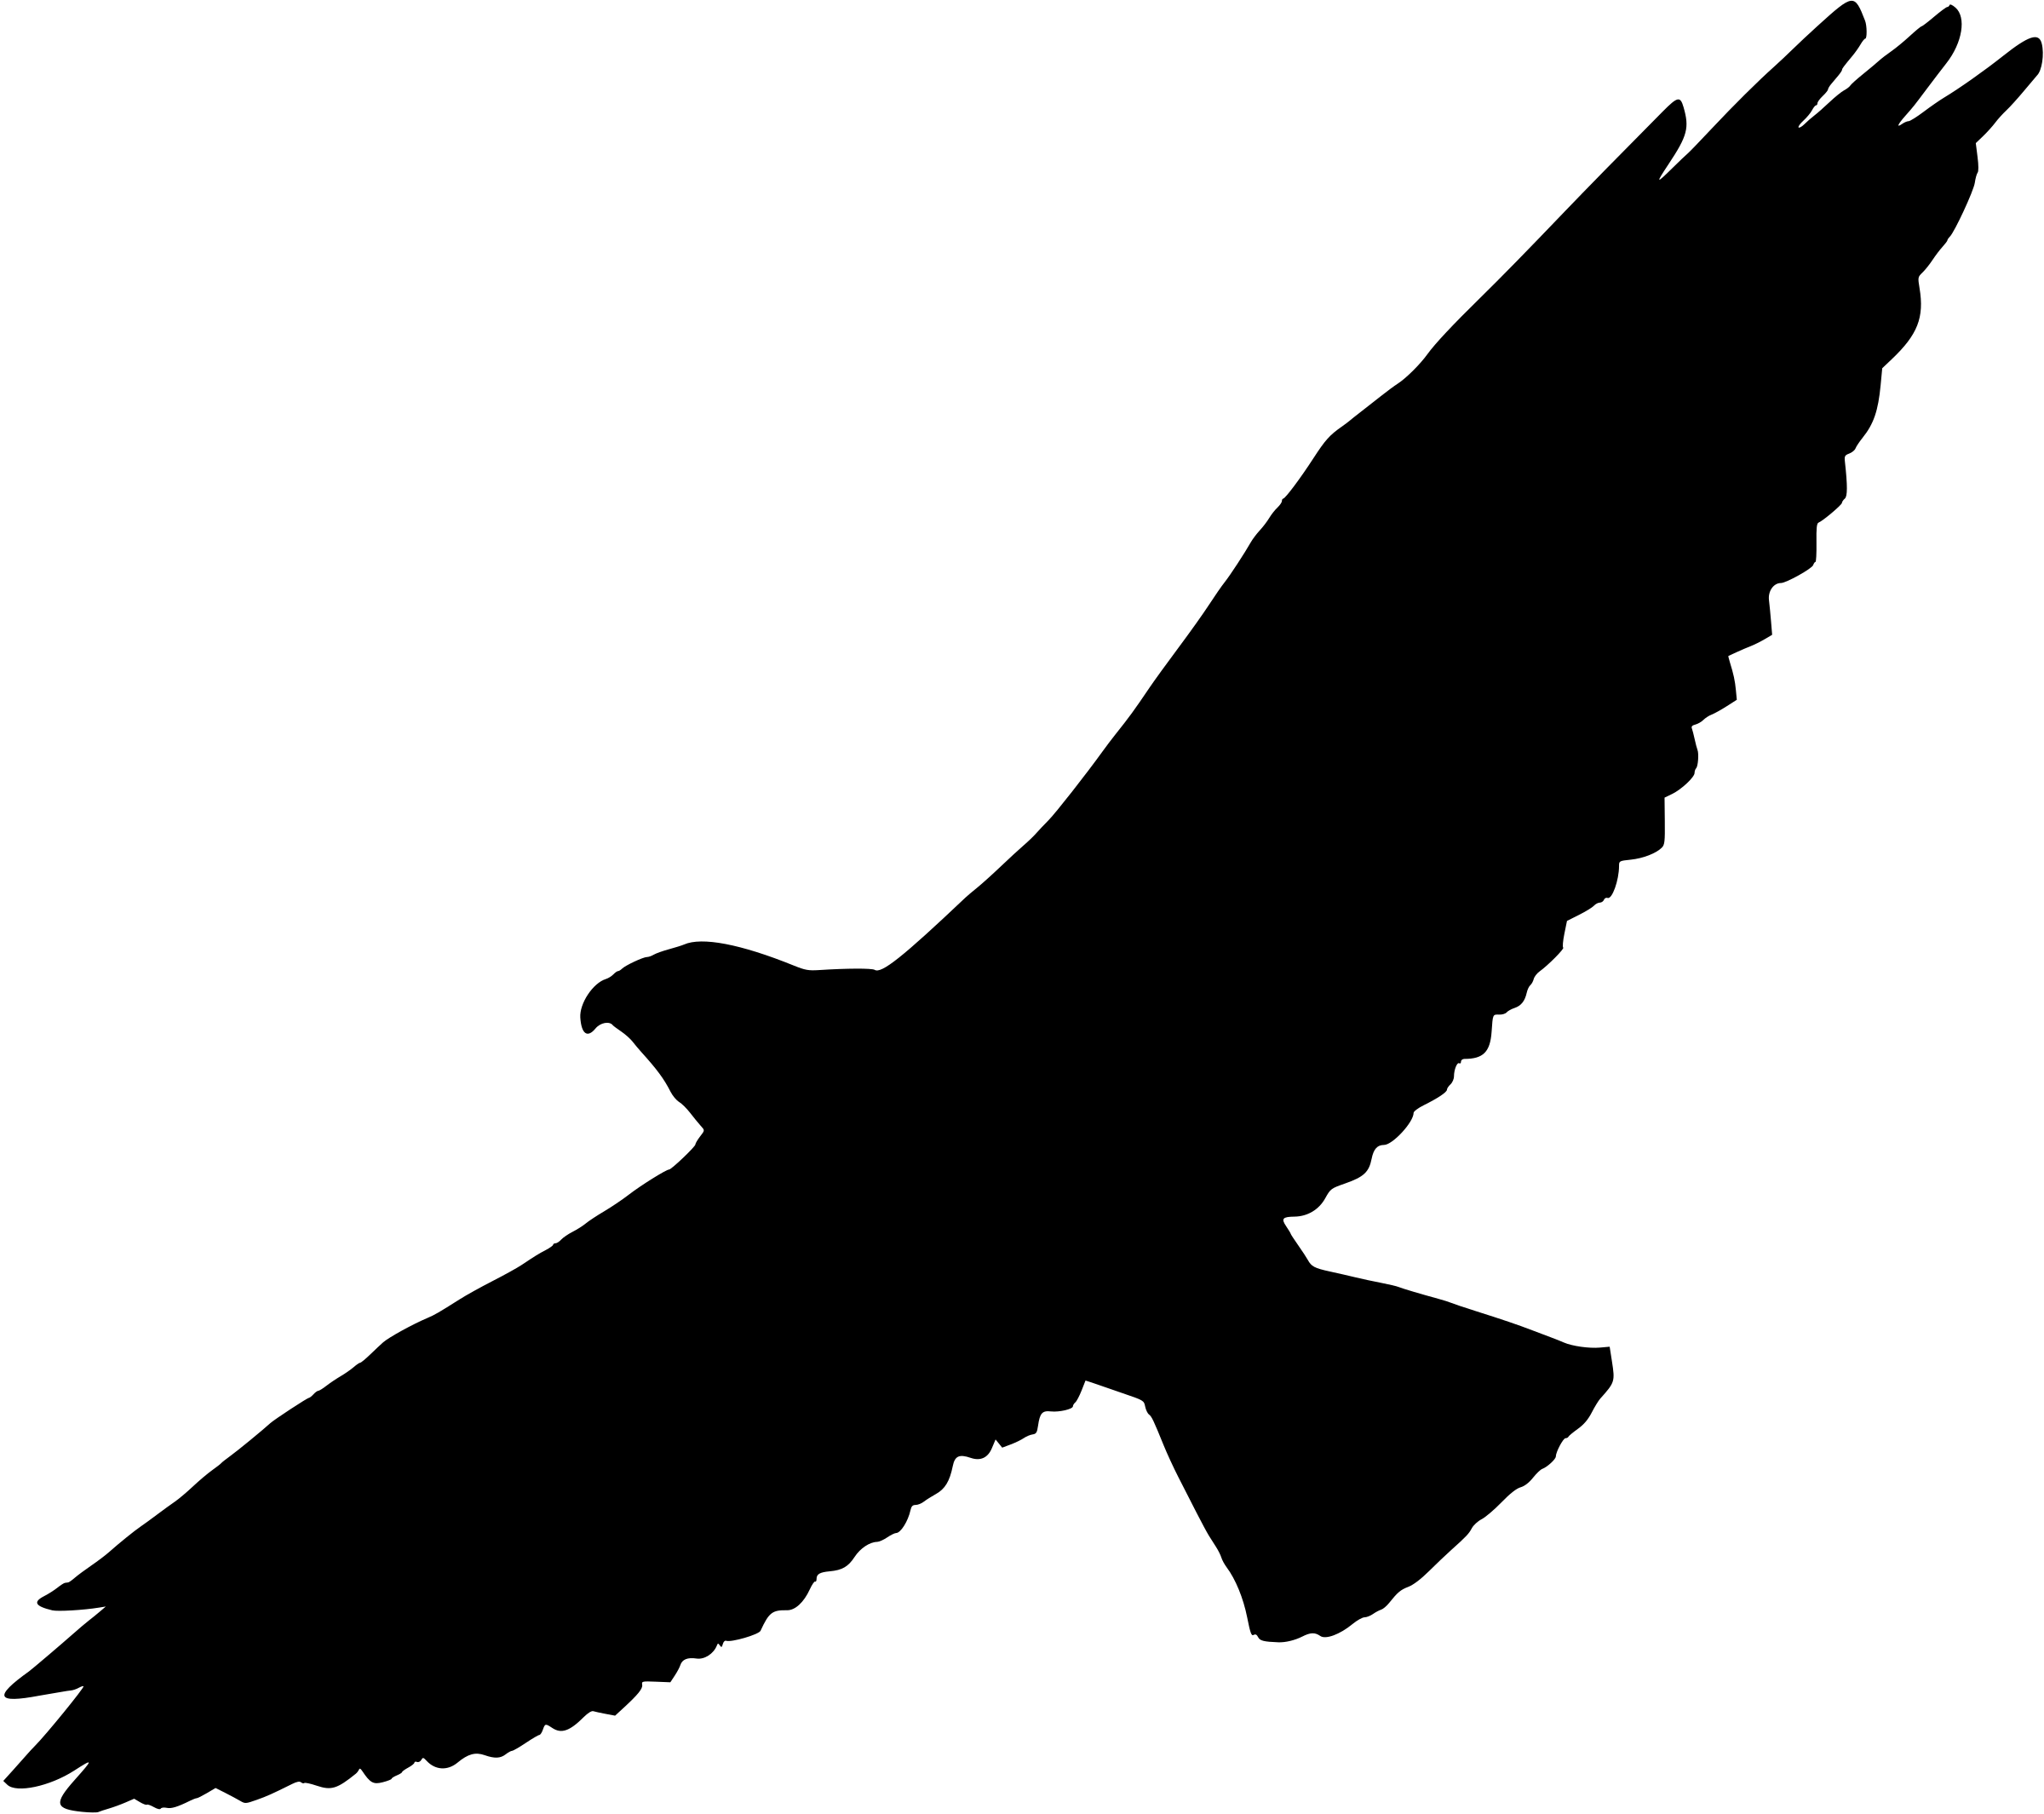 Peregrine falcon silhouette at. Clipart birds falcons